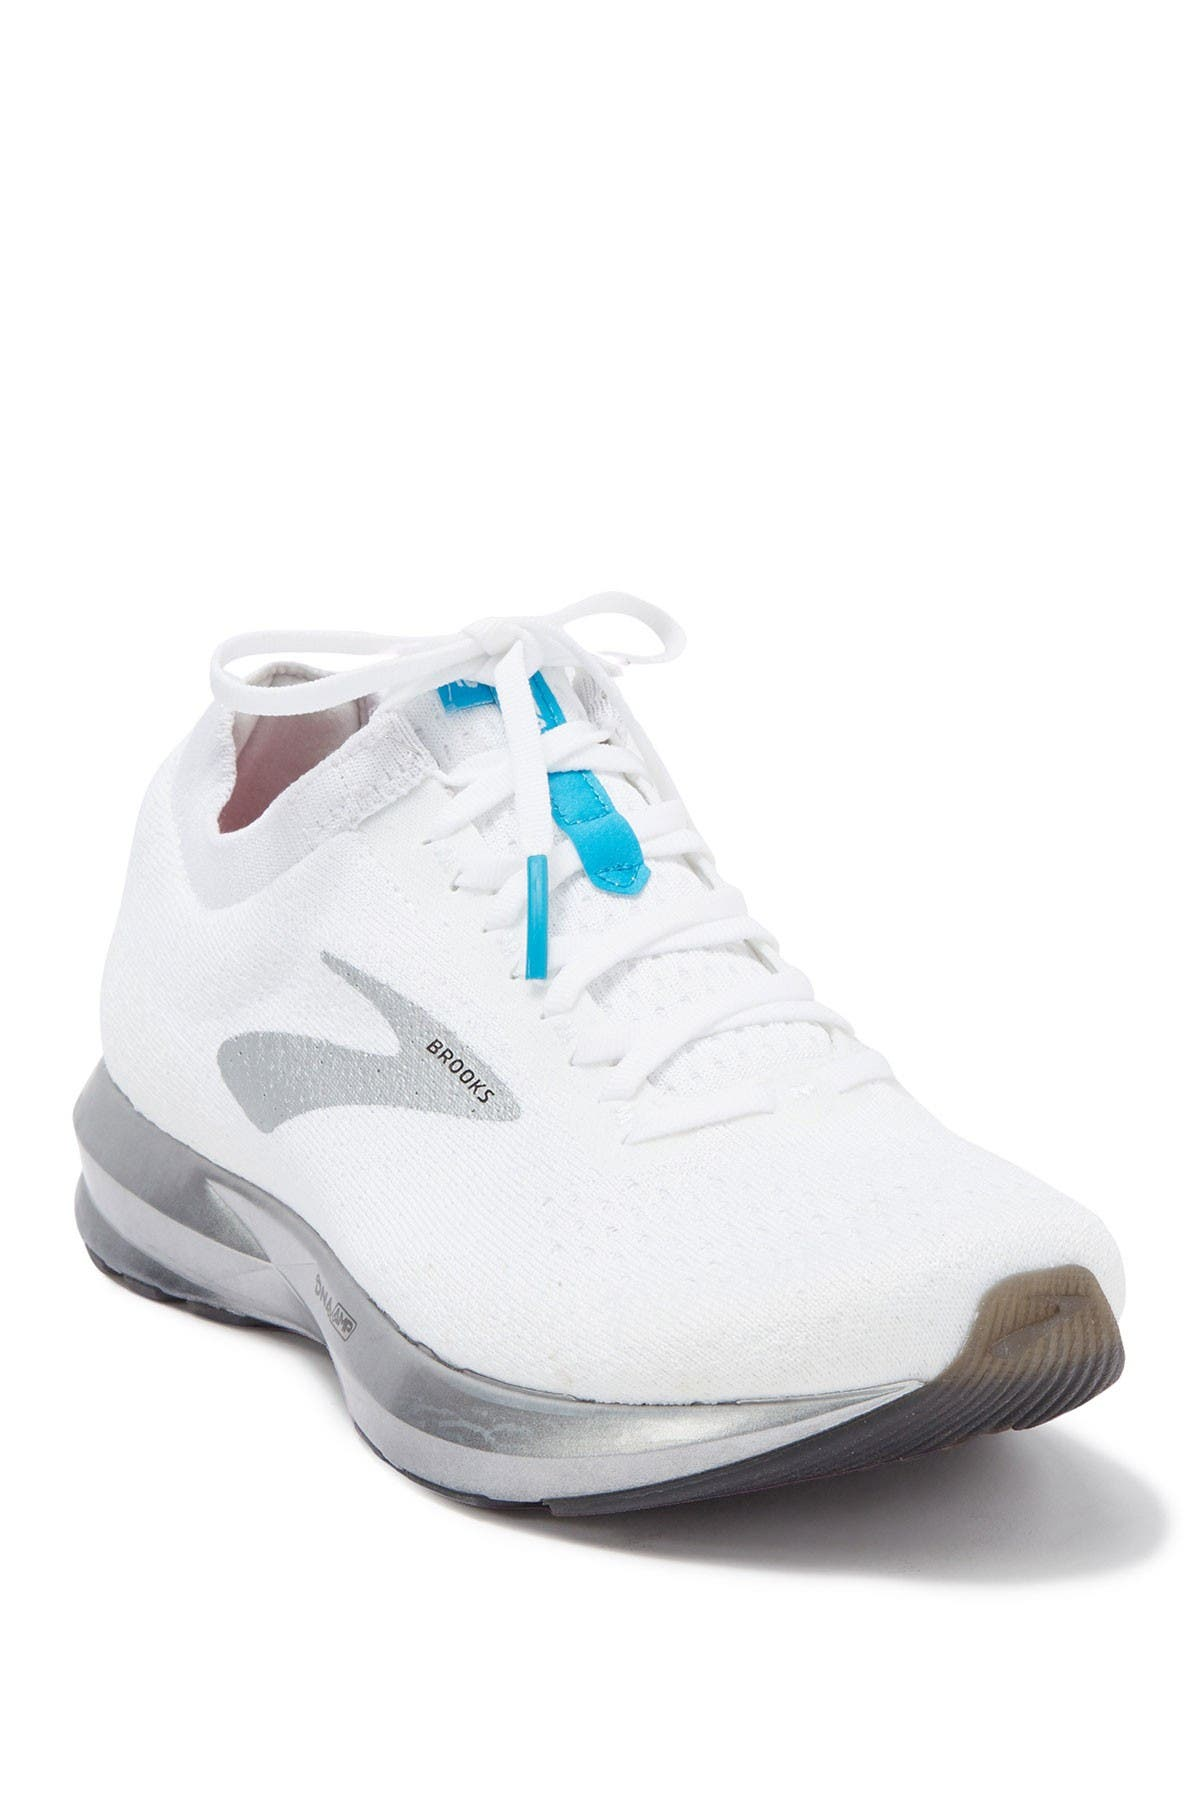 Image of Brooks Levitate 2 Running Sneaker